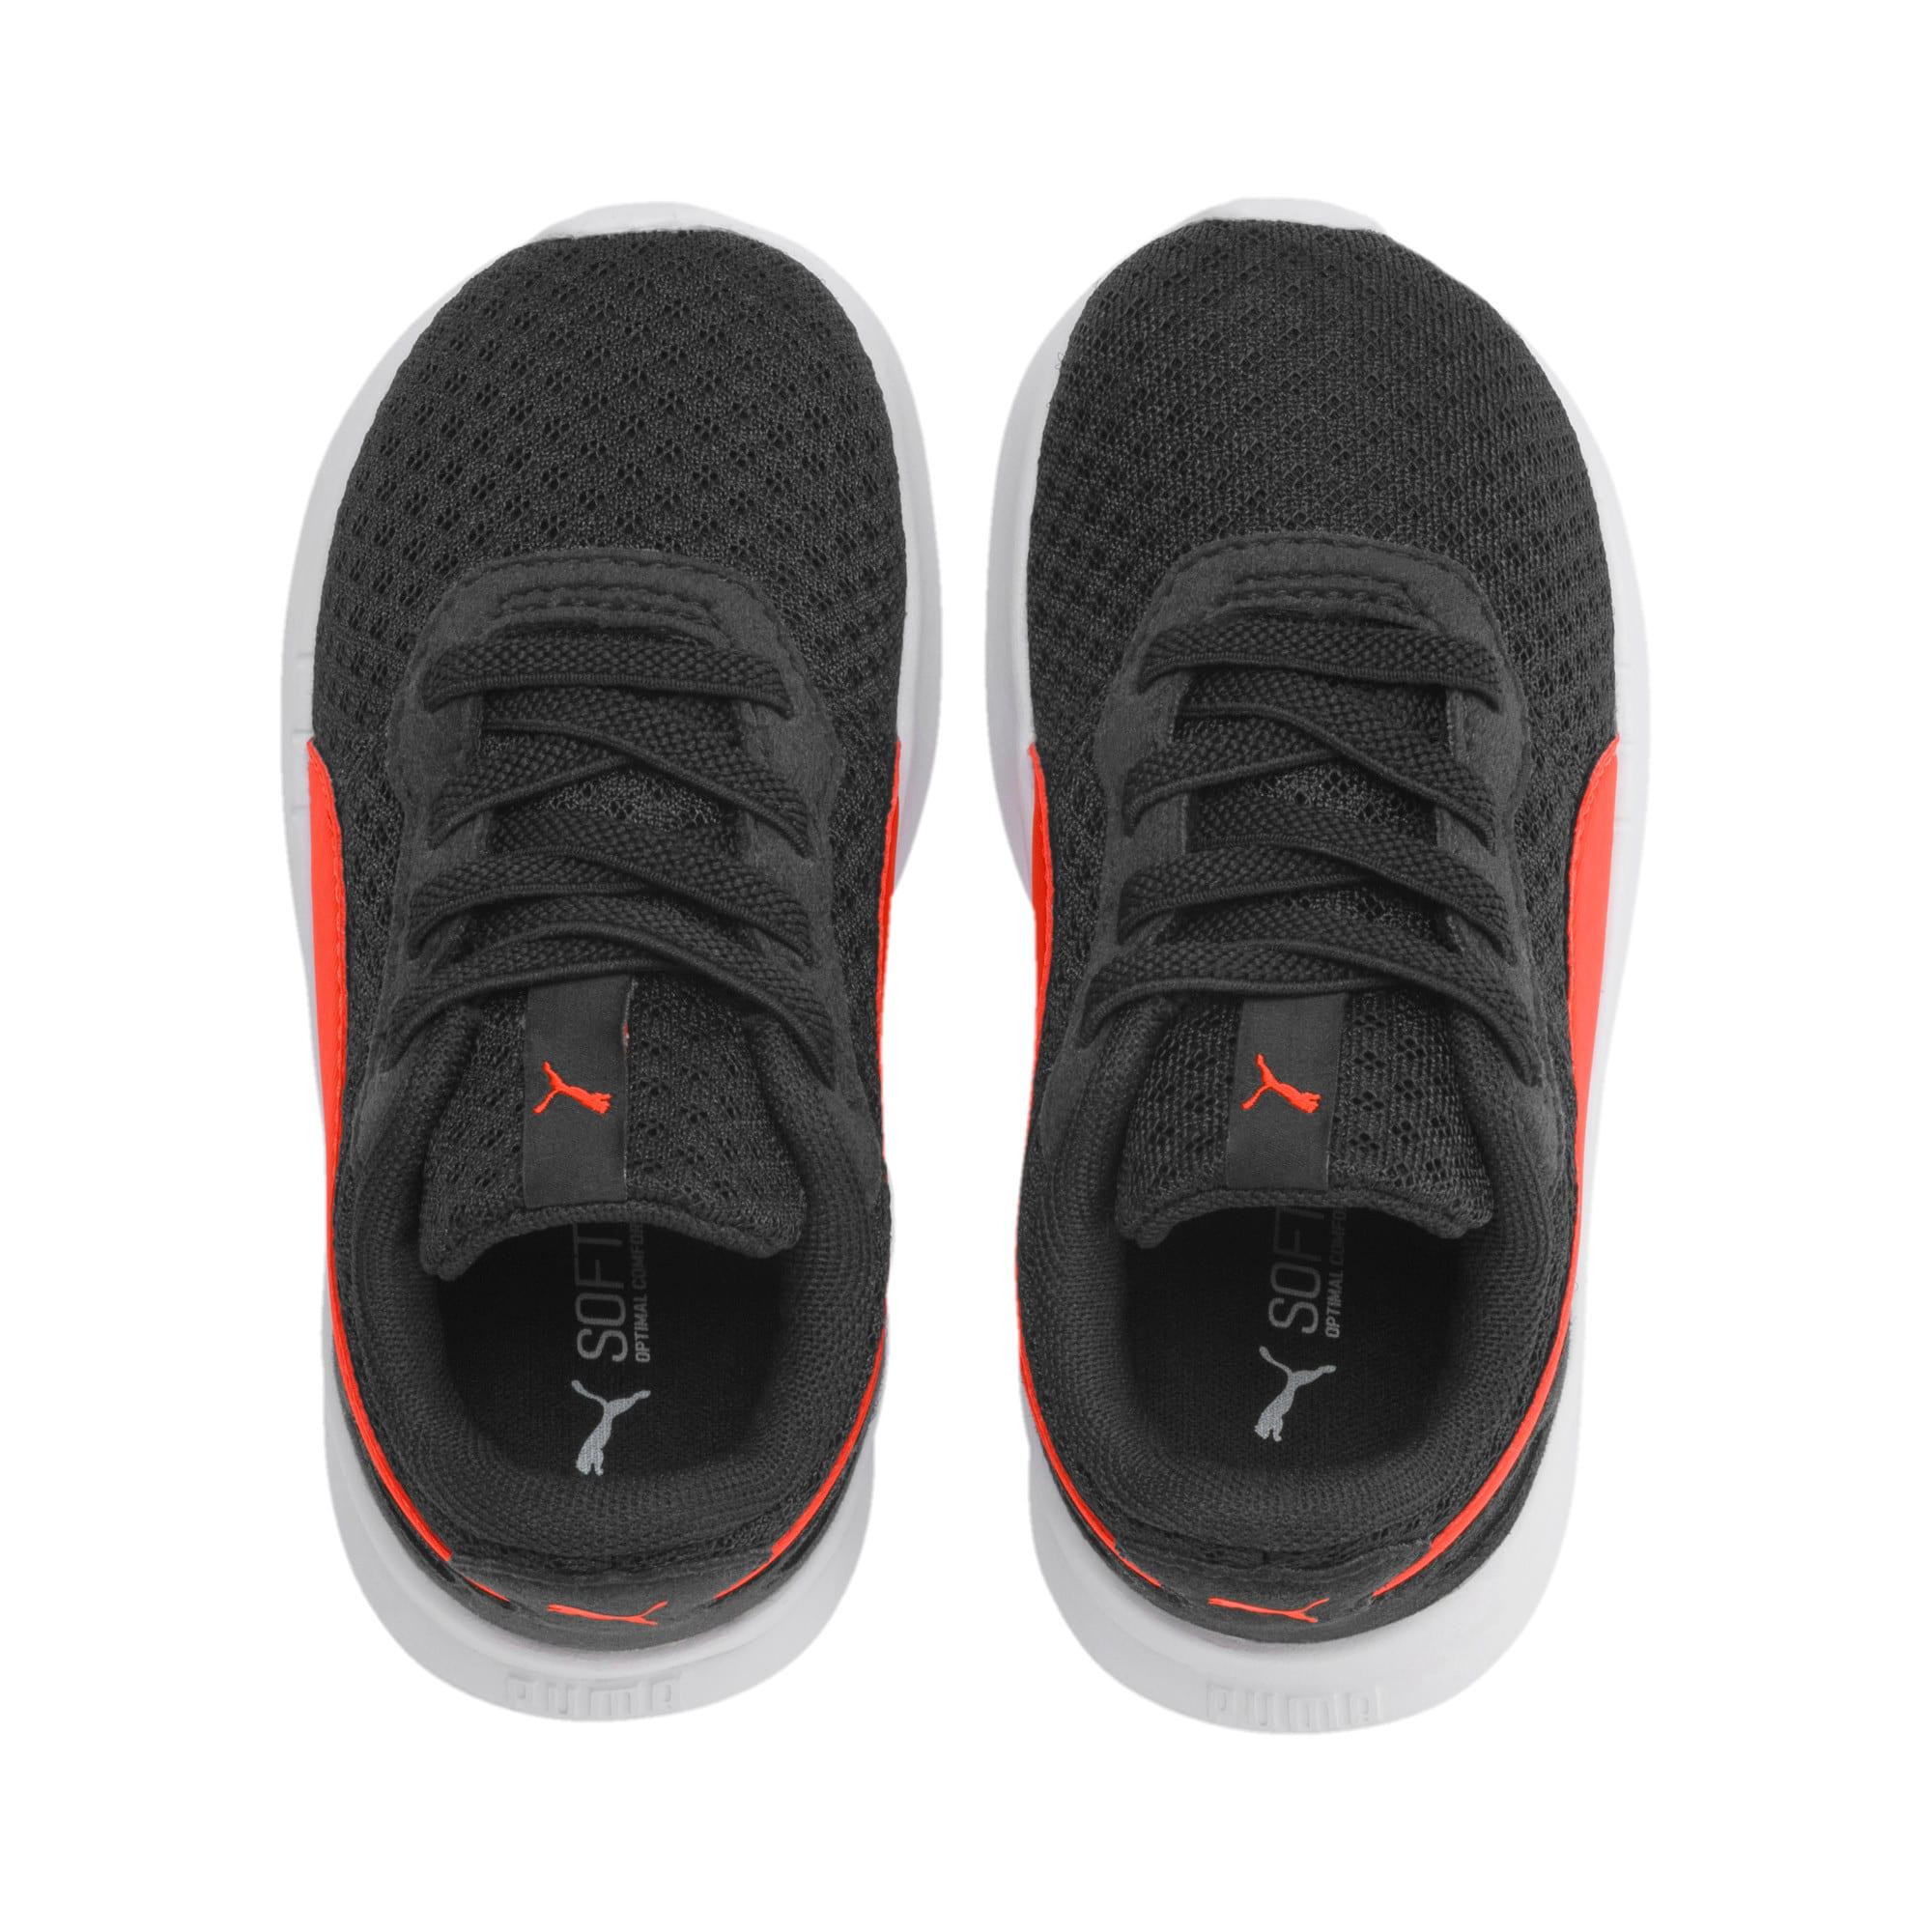 Thumbnail 6 of ST Activate AC Toddler Shoes, Puma Black-Cherry Tomato, medium